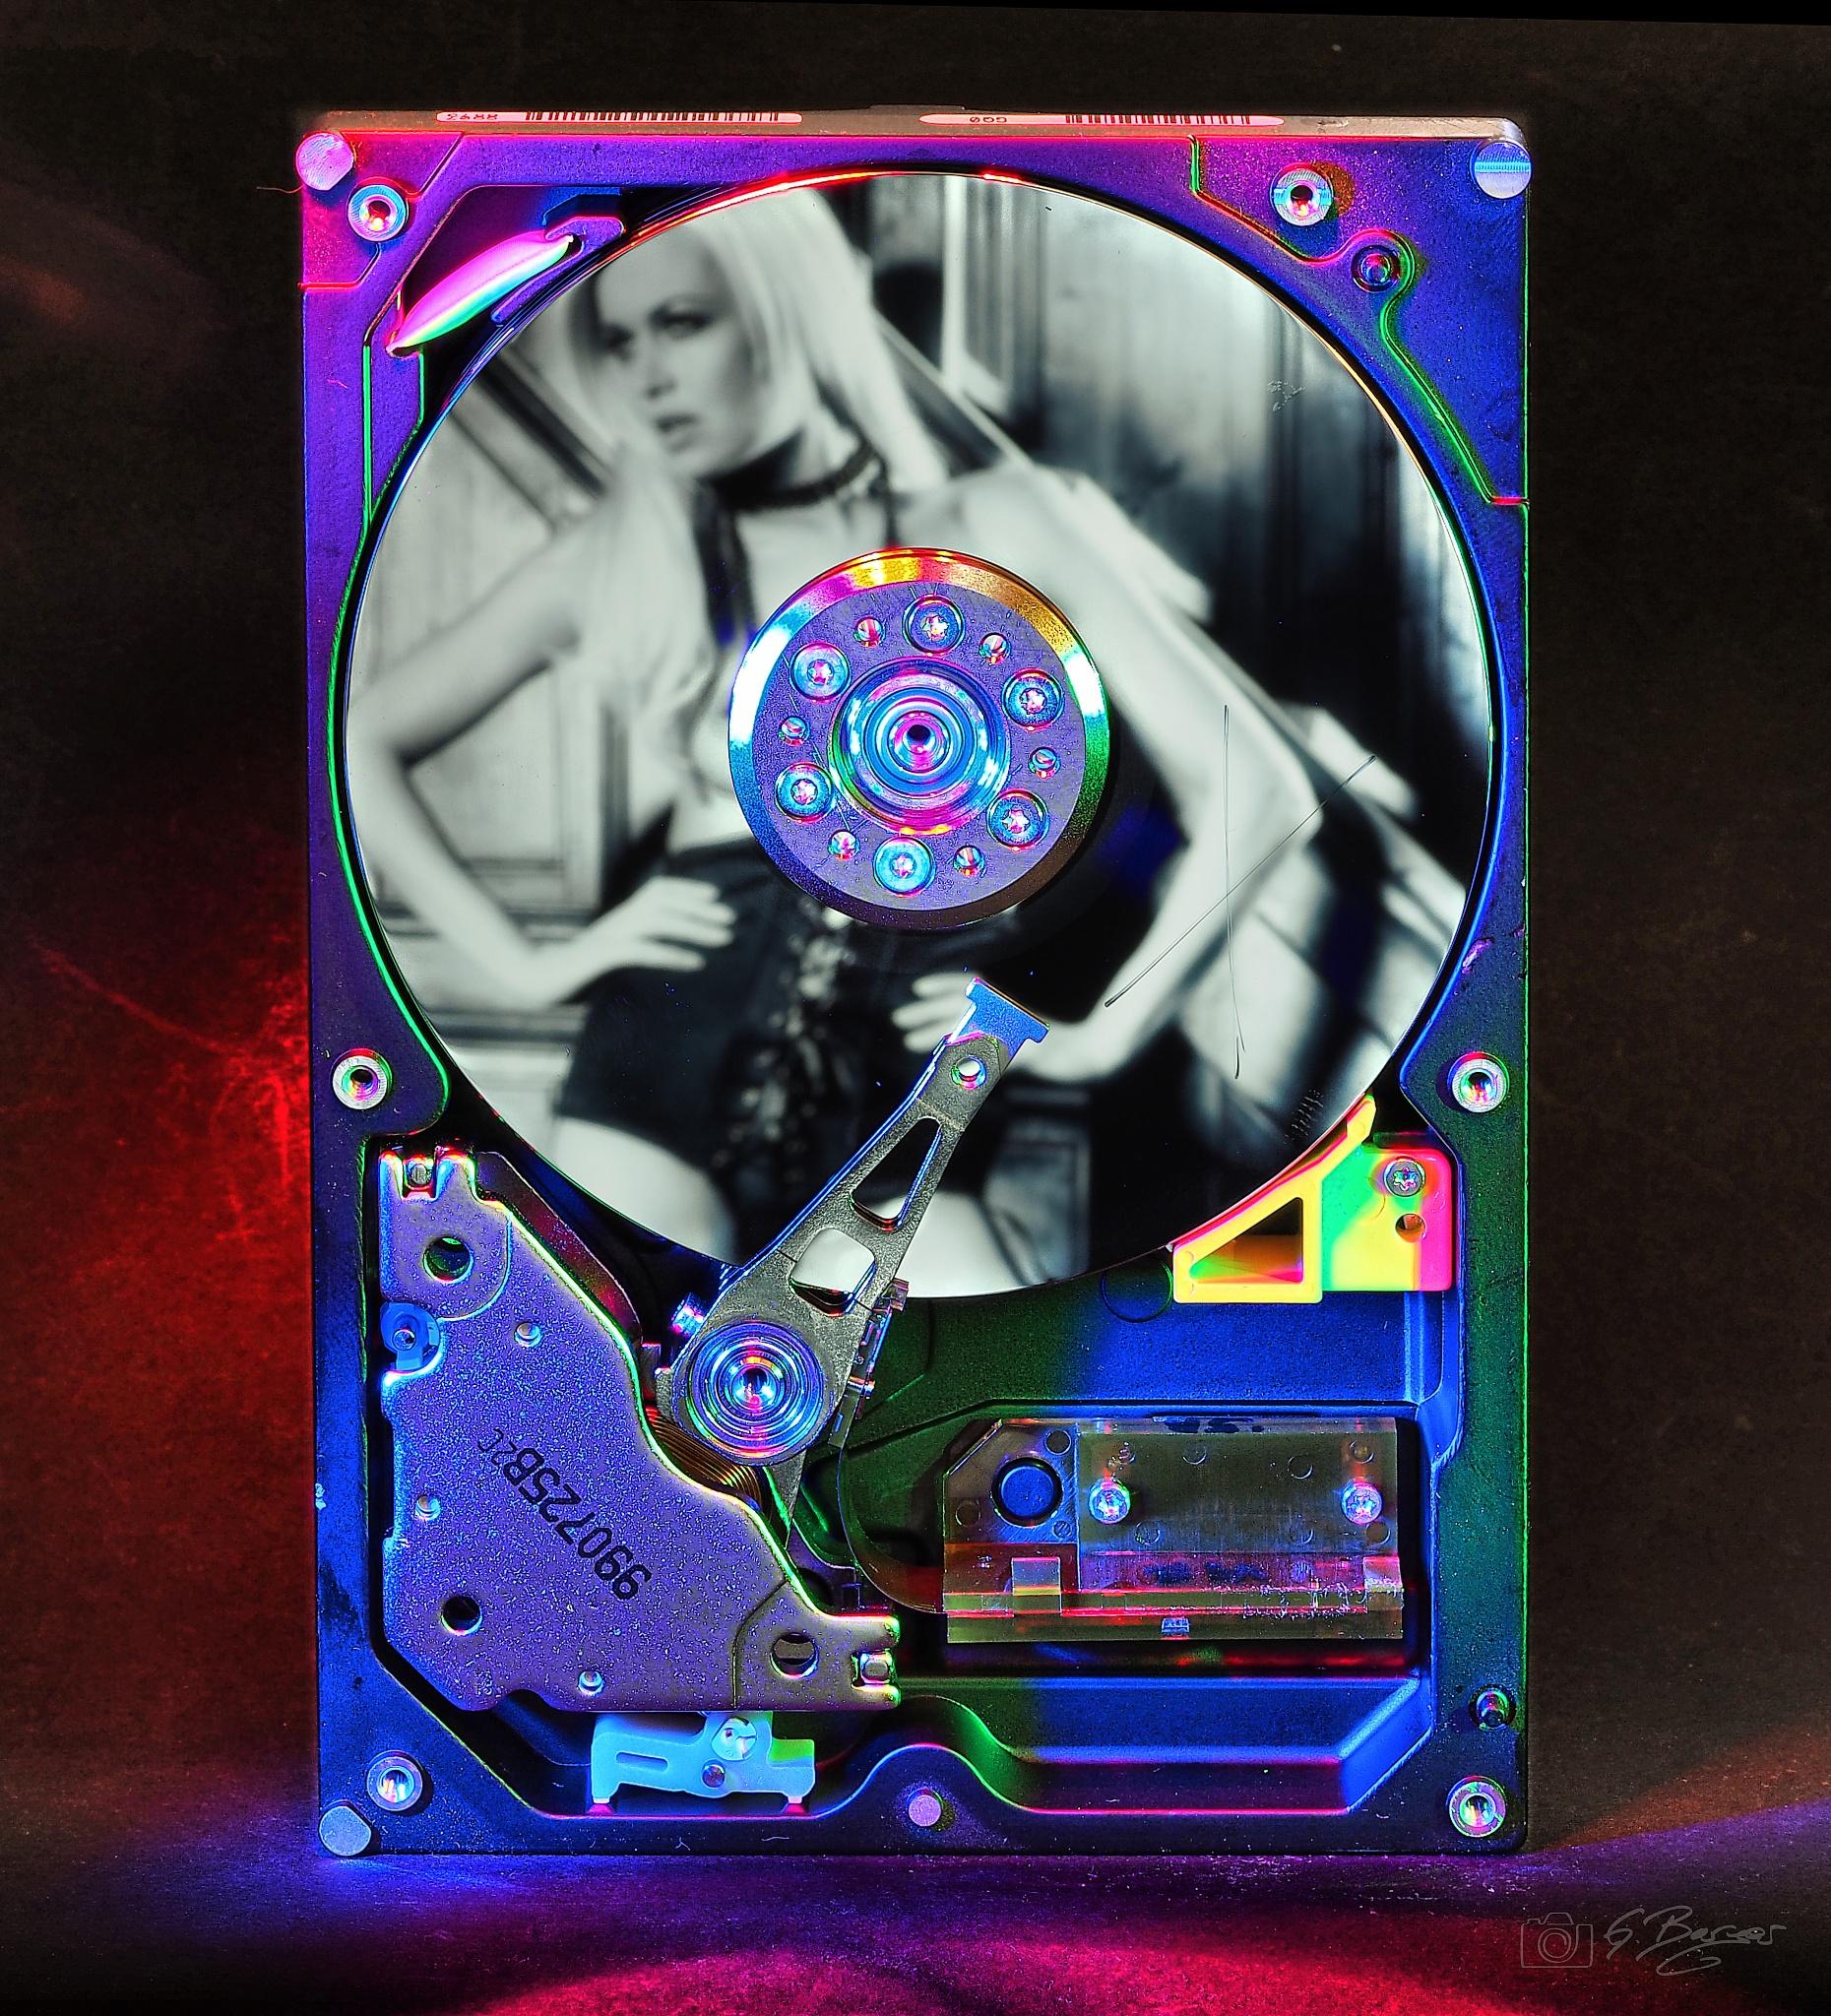 Pix on a Harddisc by Gerald Berger